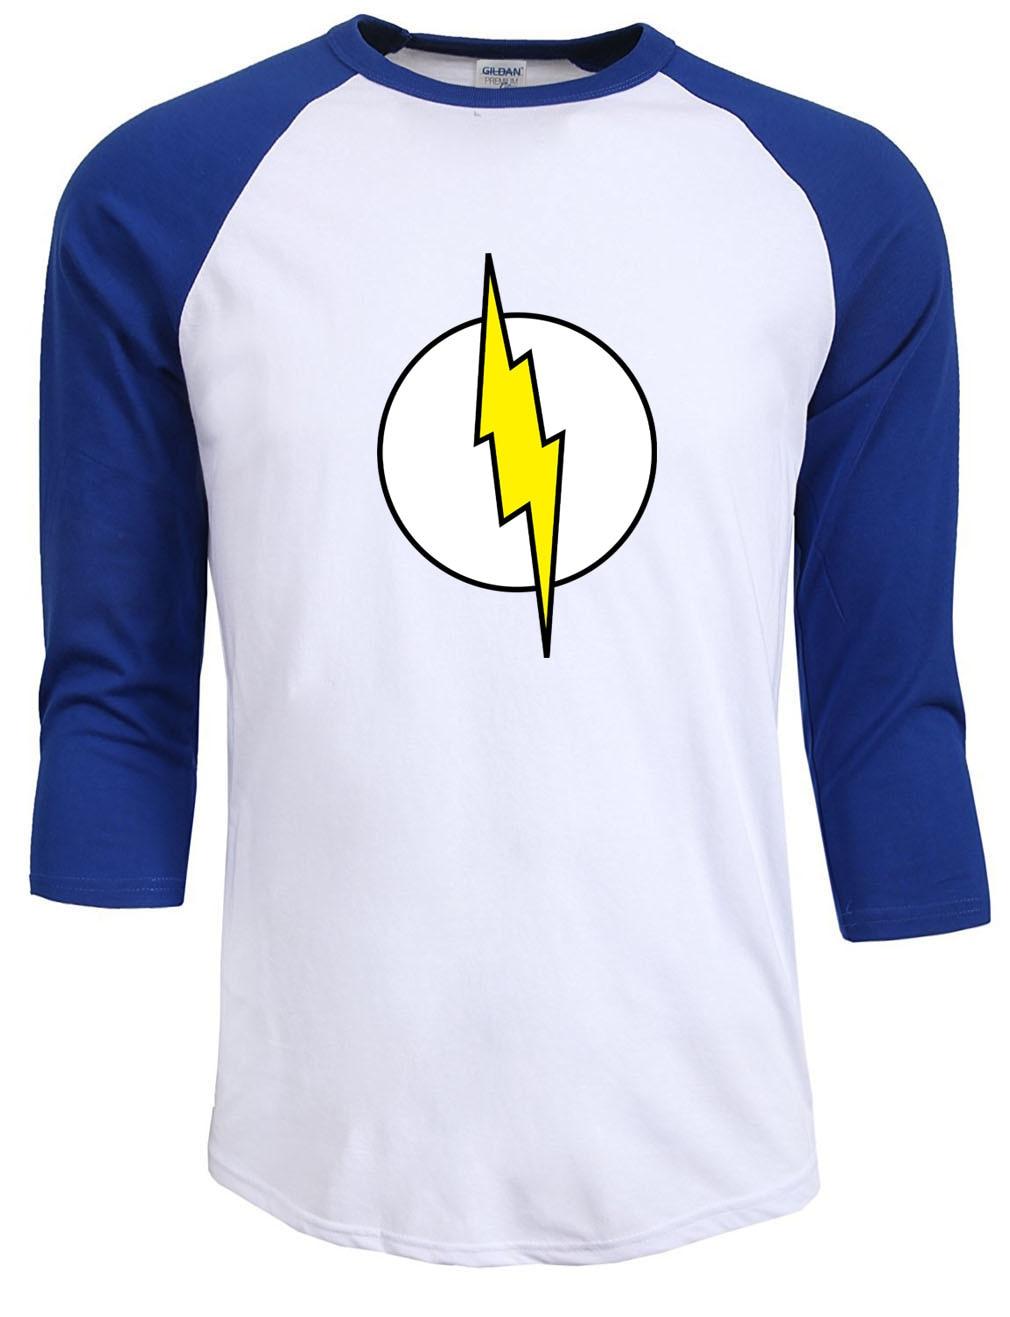 homme streetwear T-särk raglan varrukas Sheldon Cooper super kangelane roheline latern flash cosplay t särgid mehed geek mees tshirt